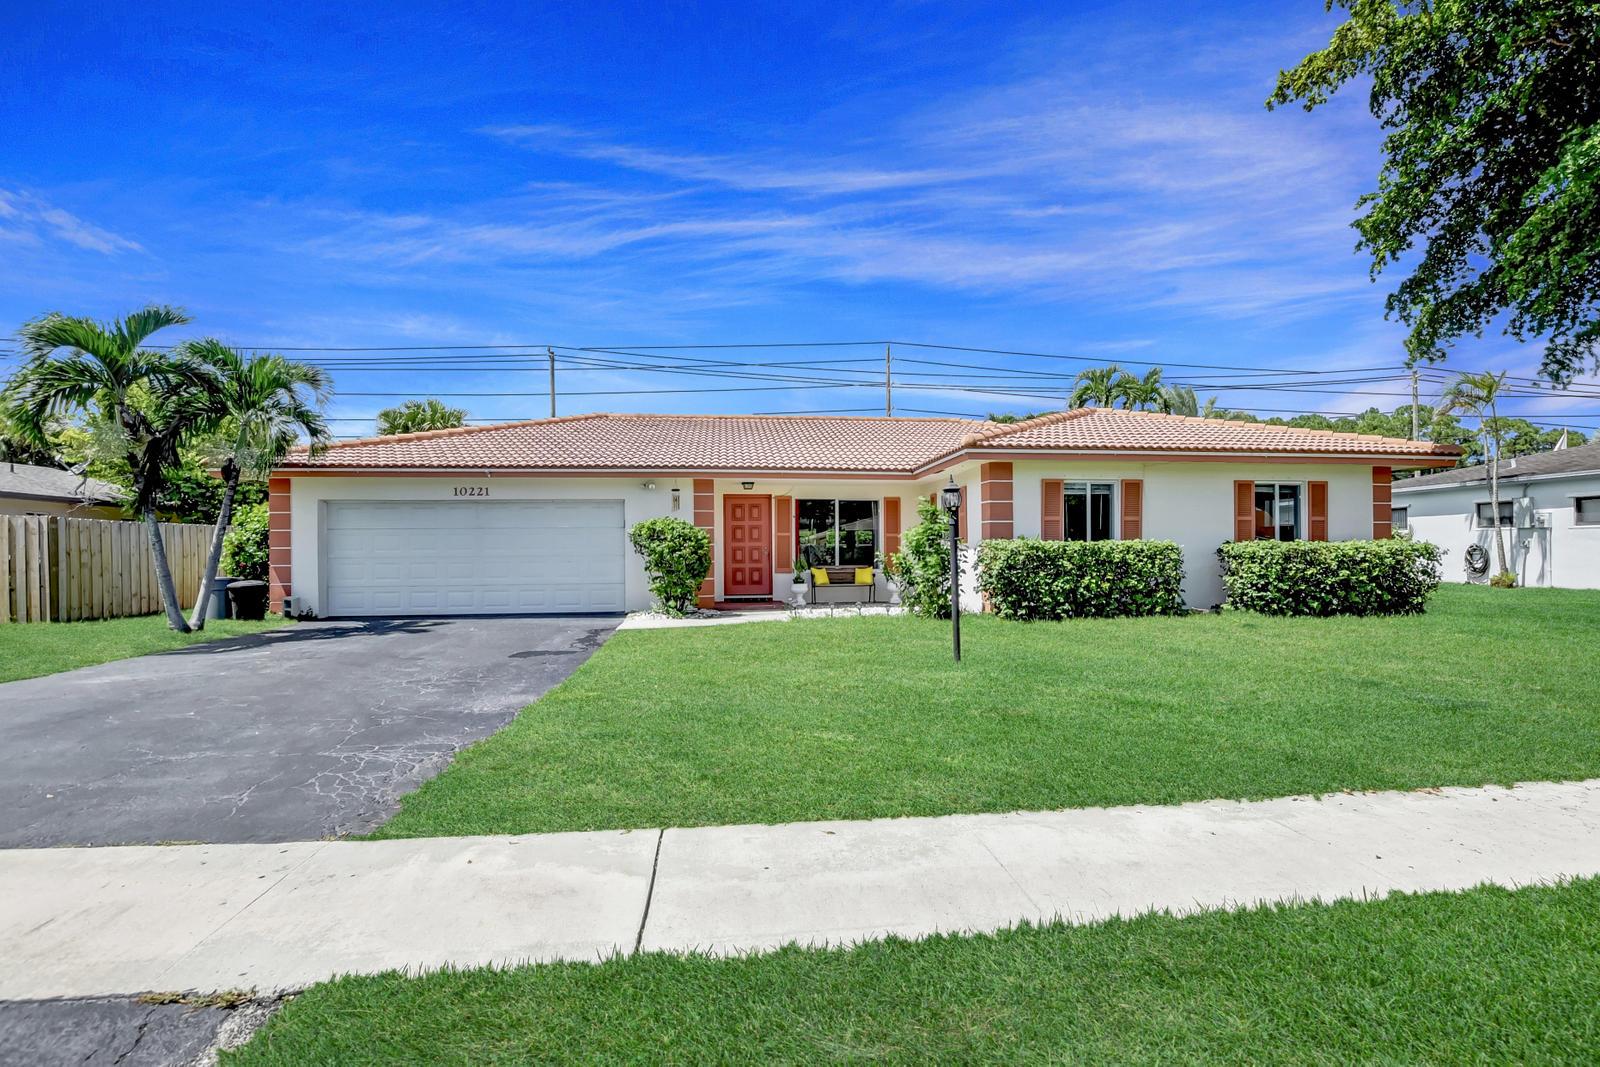 10221 Dorchester Drive Boca Raton, FL 33428